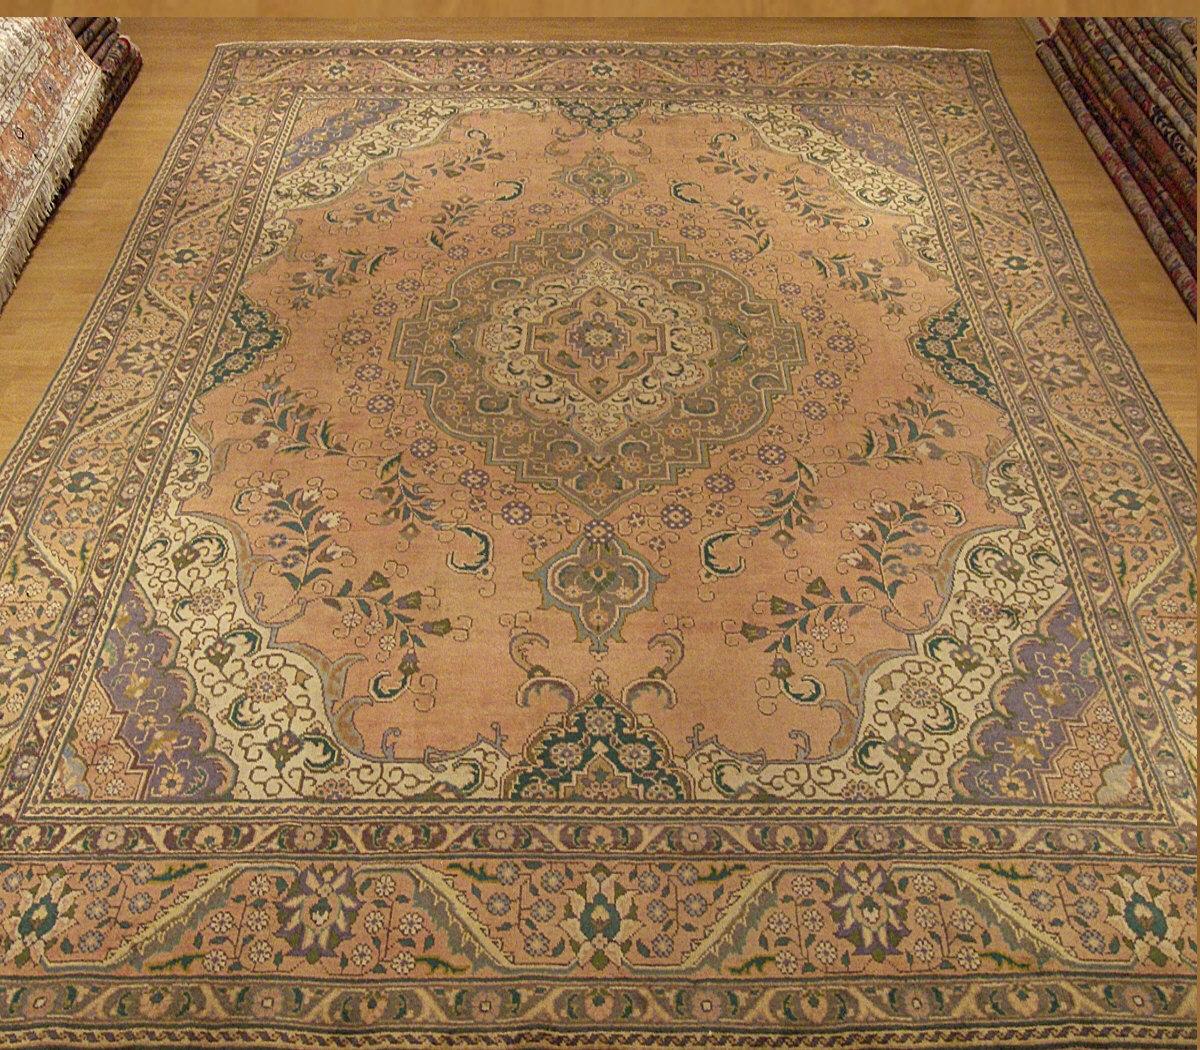 10x13 Beautiful Hand Made Antique Persian Tabriz